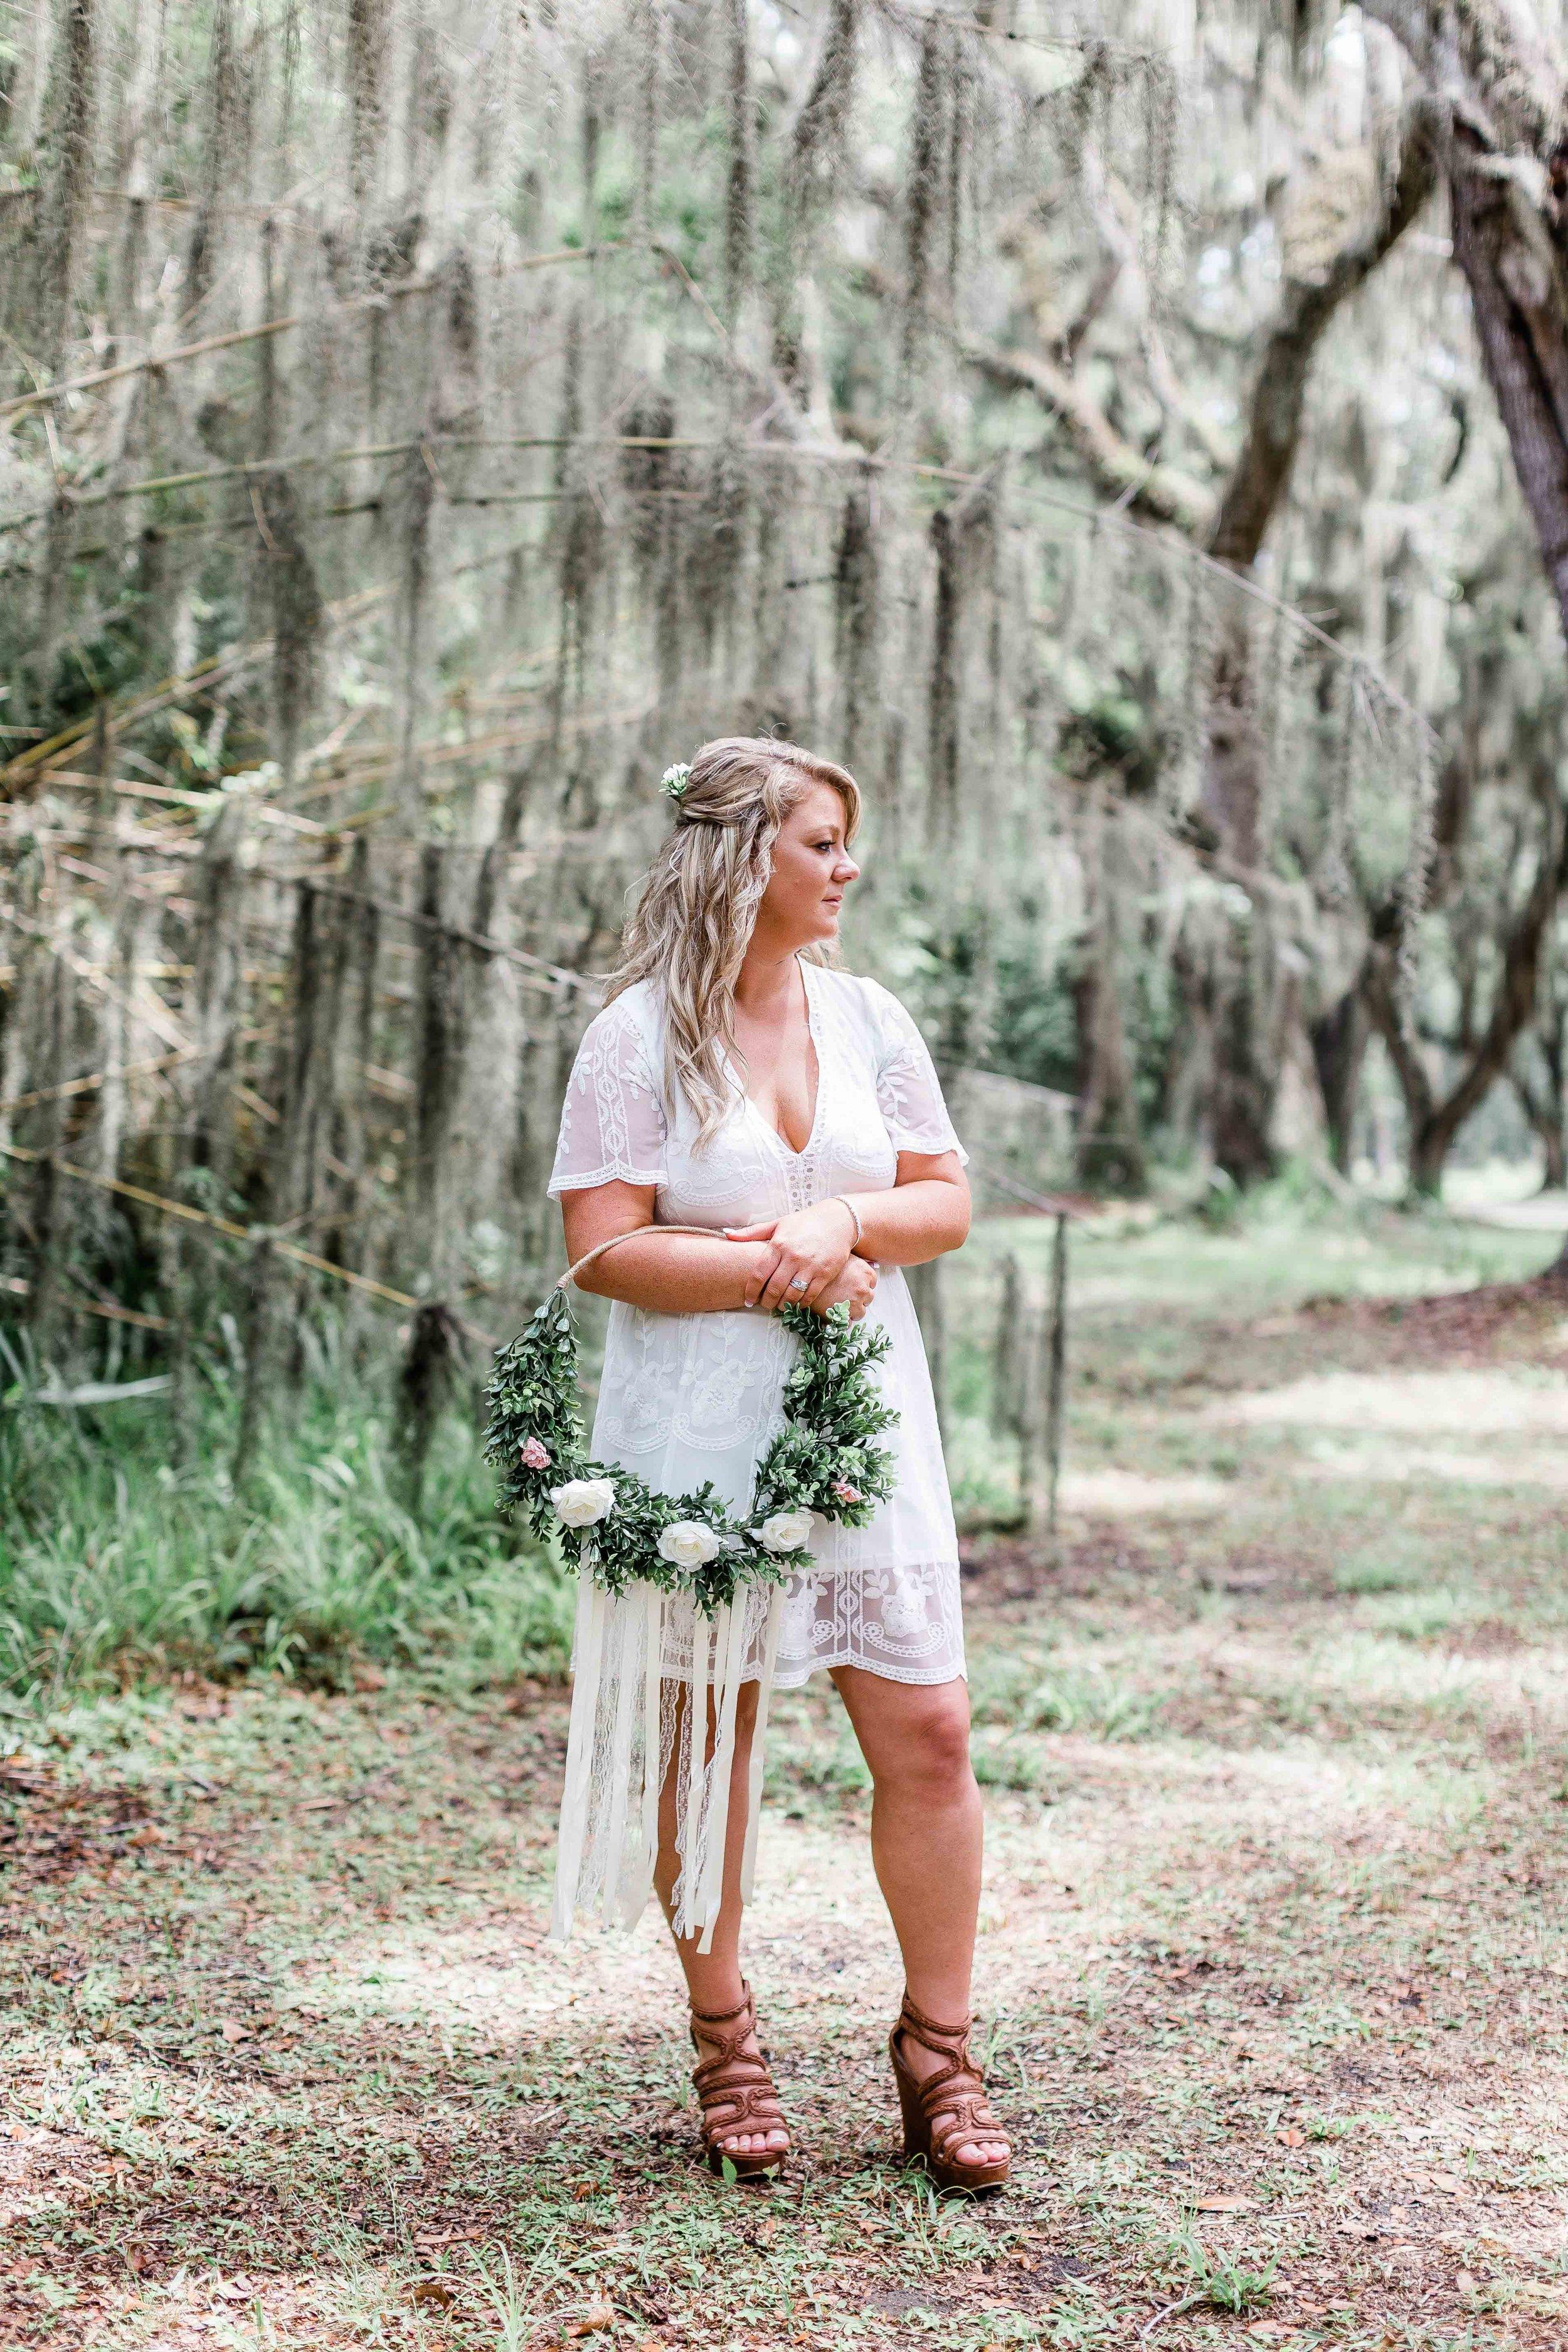 20190727Georgia-Wormlsoe Plantation-Simply Eloped-Savannah Wedding Photographer- Southern Lens Photography37.jpg